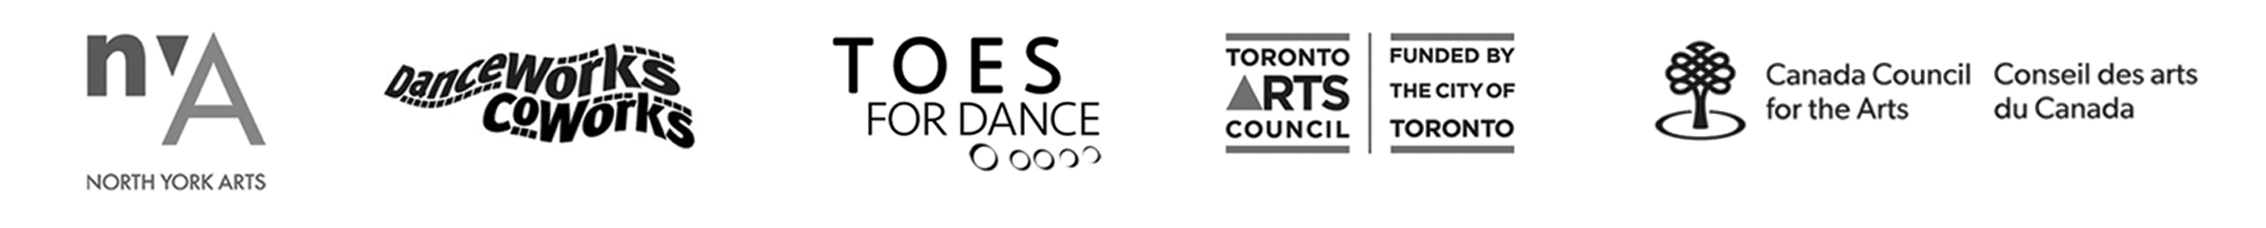 PoD logos banner horizontal.jpg